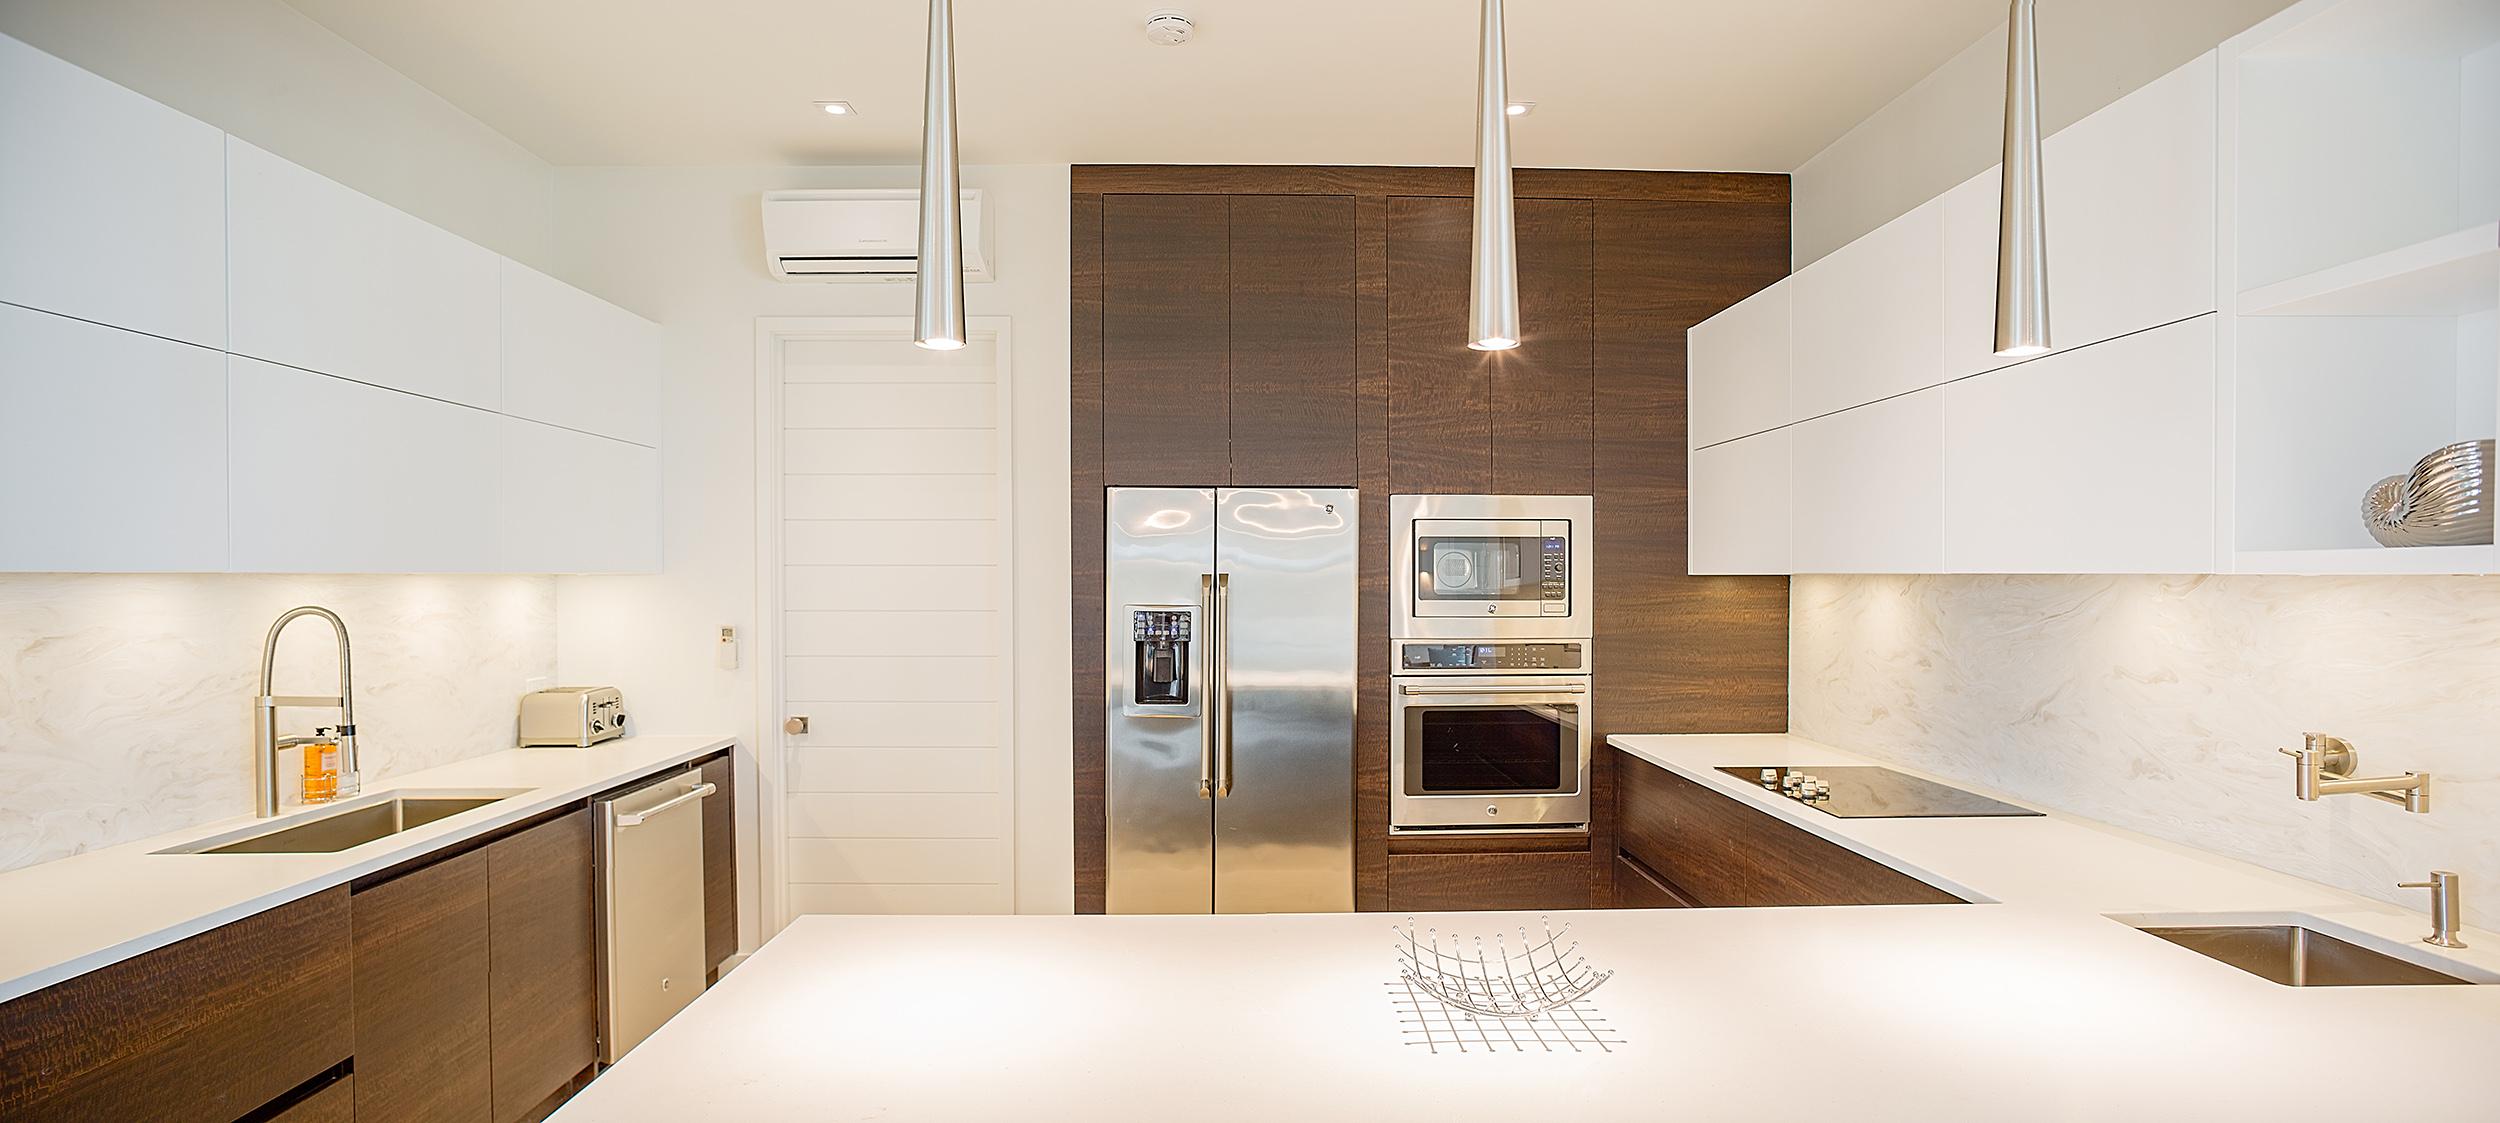 Brise De Mer - view of the kitchen